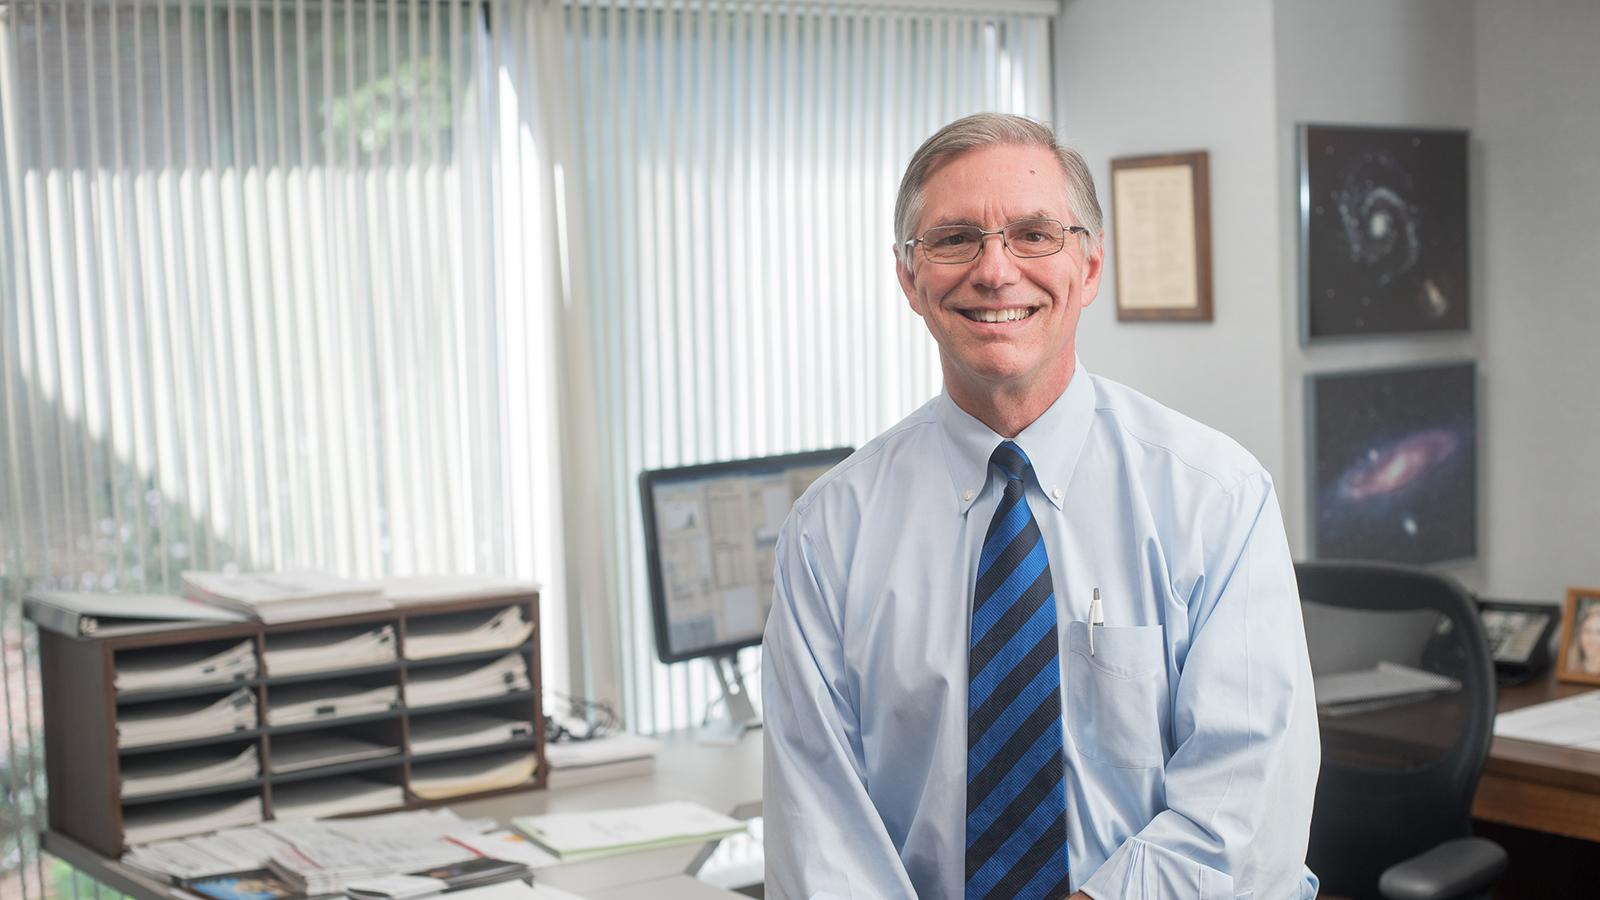 David Herrington, MD, MHS